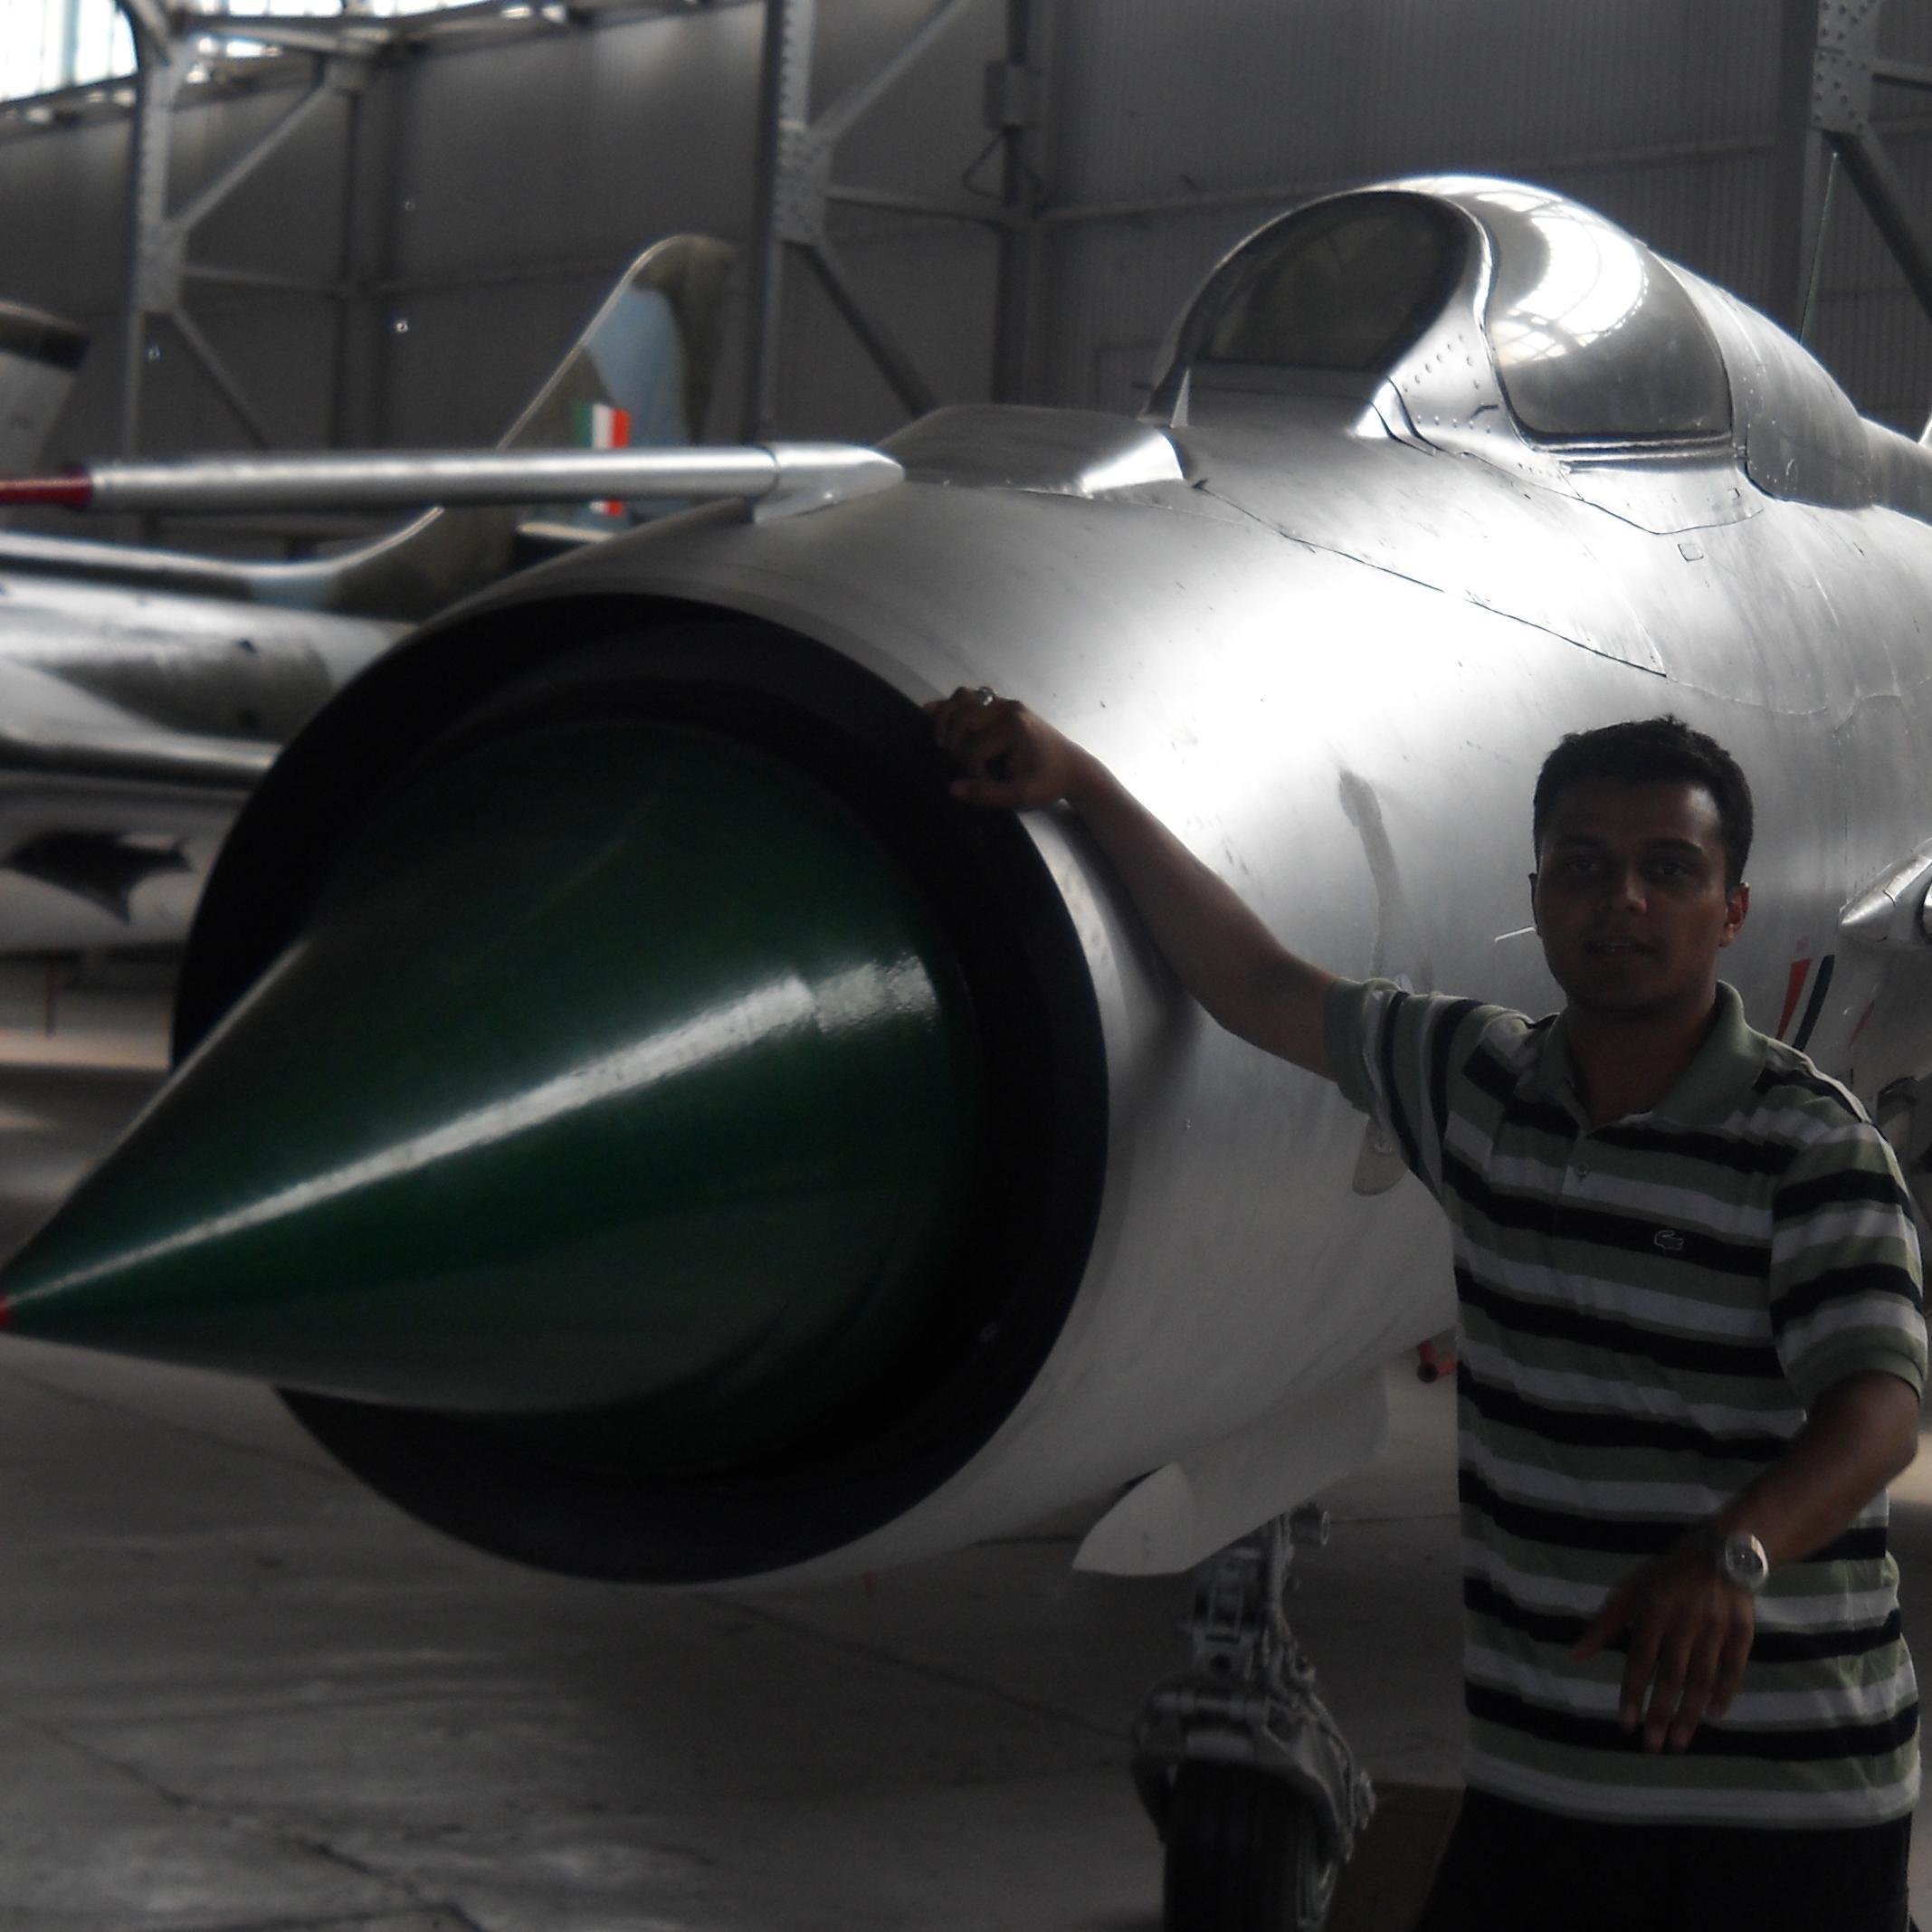 @ShirajPokharel